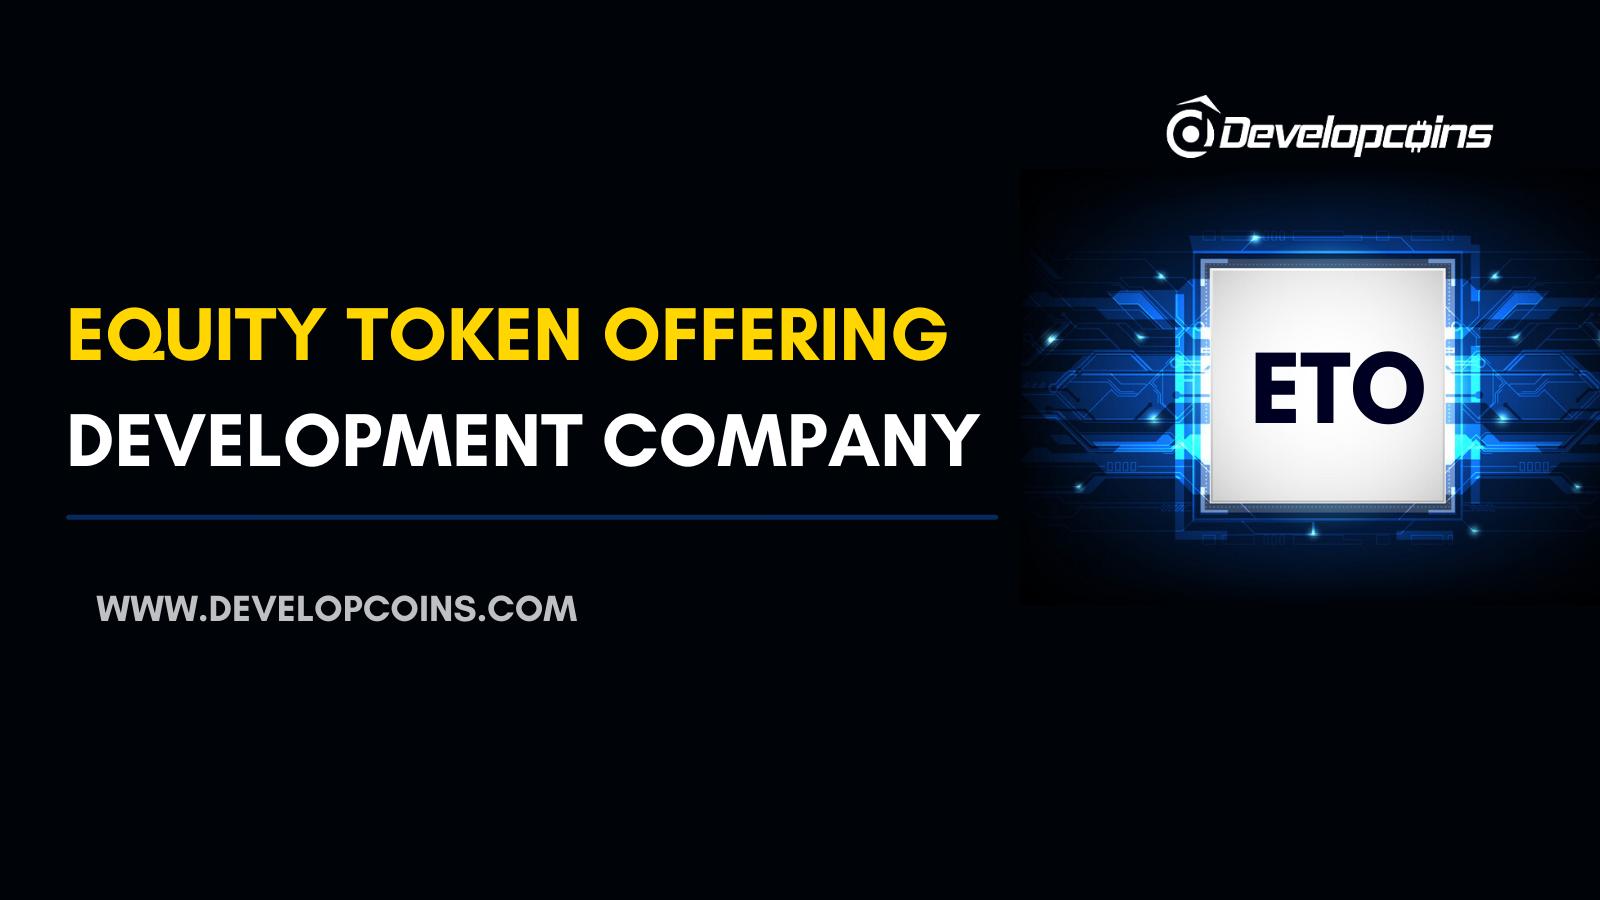 ETO Development Company | Equity Token Offering Service